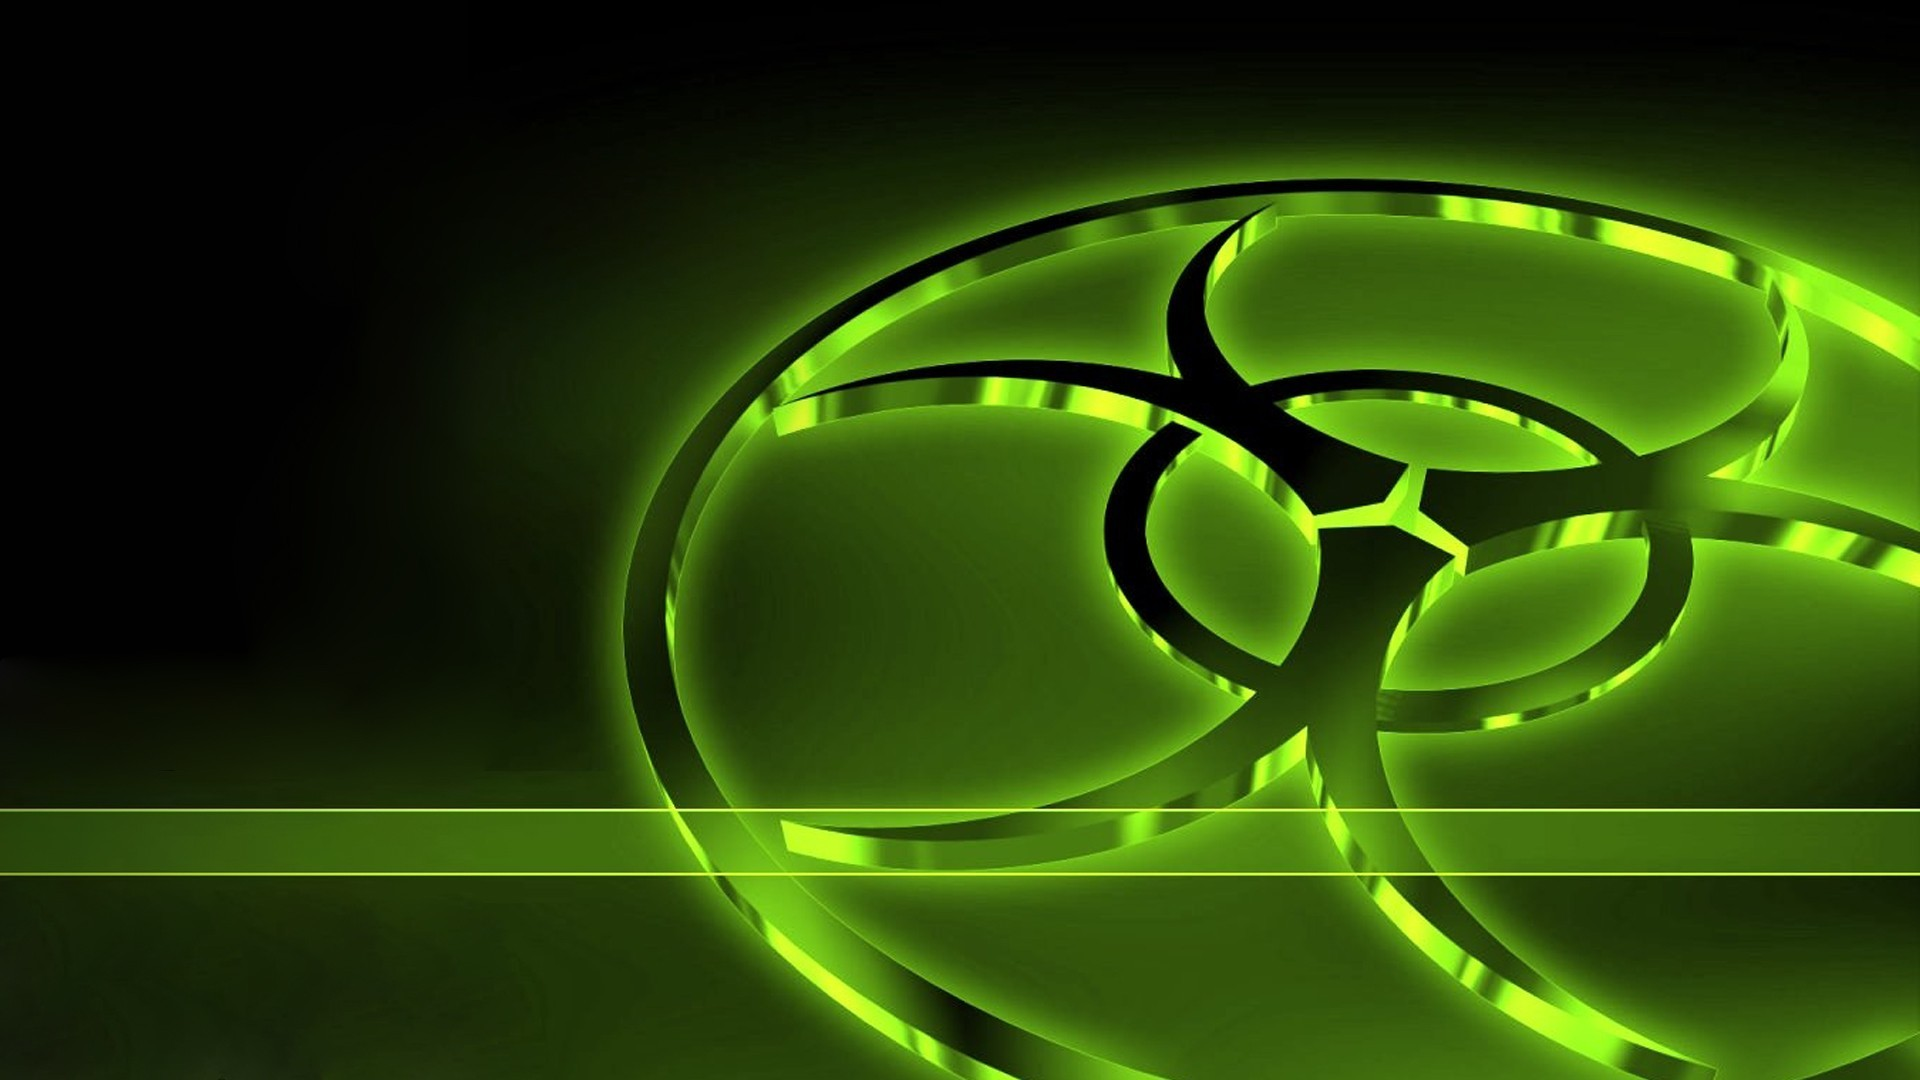 Download Free Green Neon Wallpaper.